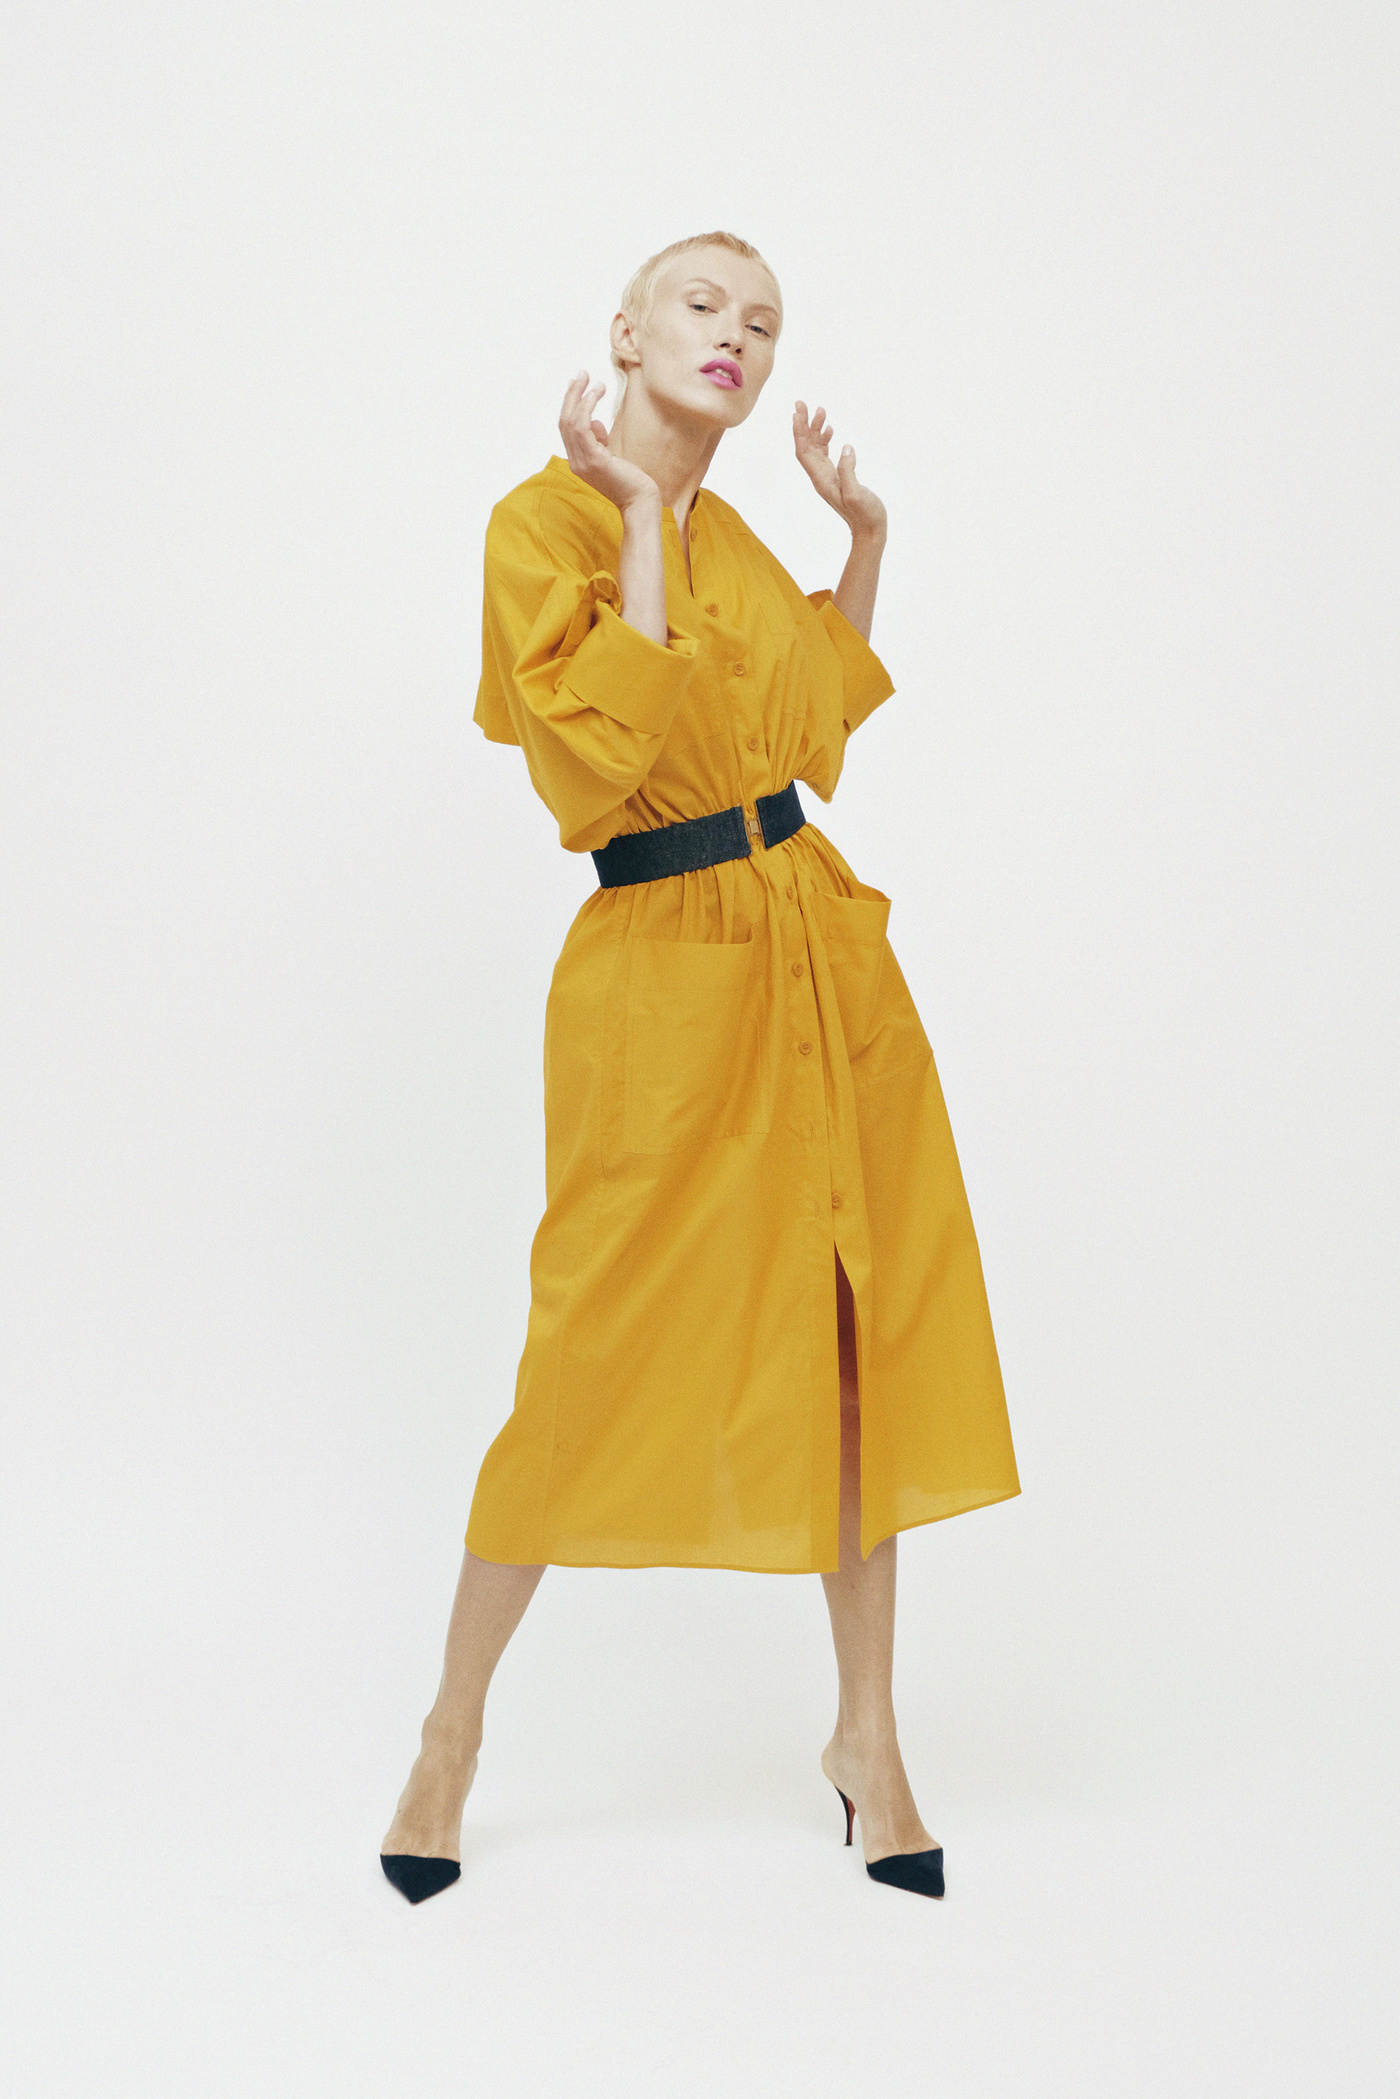 la-boite-d-allumettes-paris-fashion-week-martin-grant-SS20-credit-daniel-roche-looks